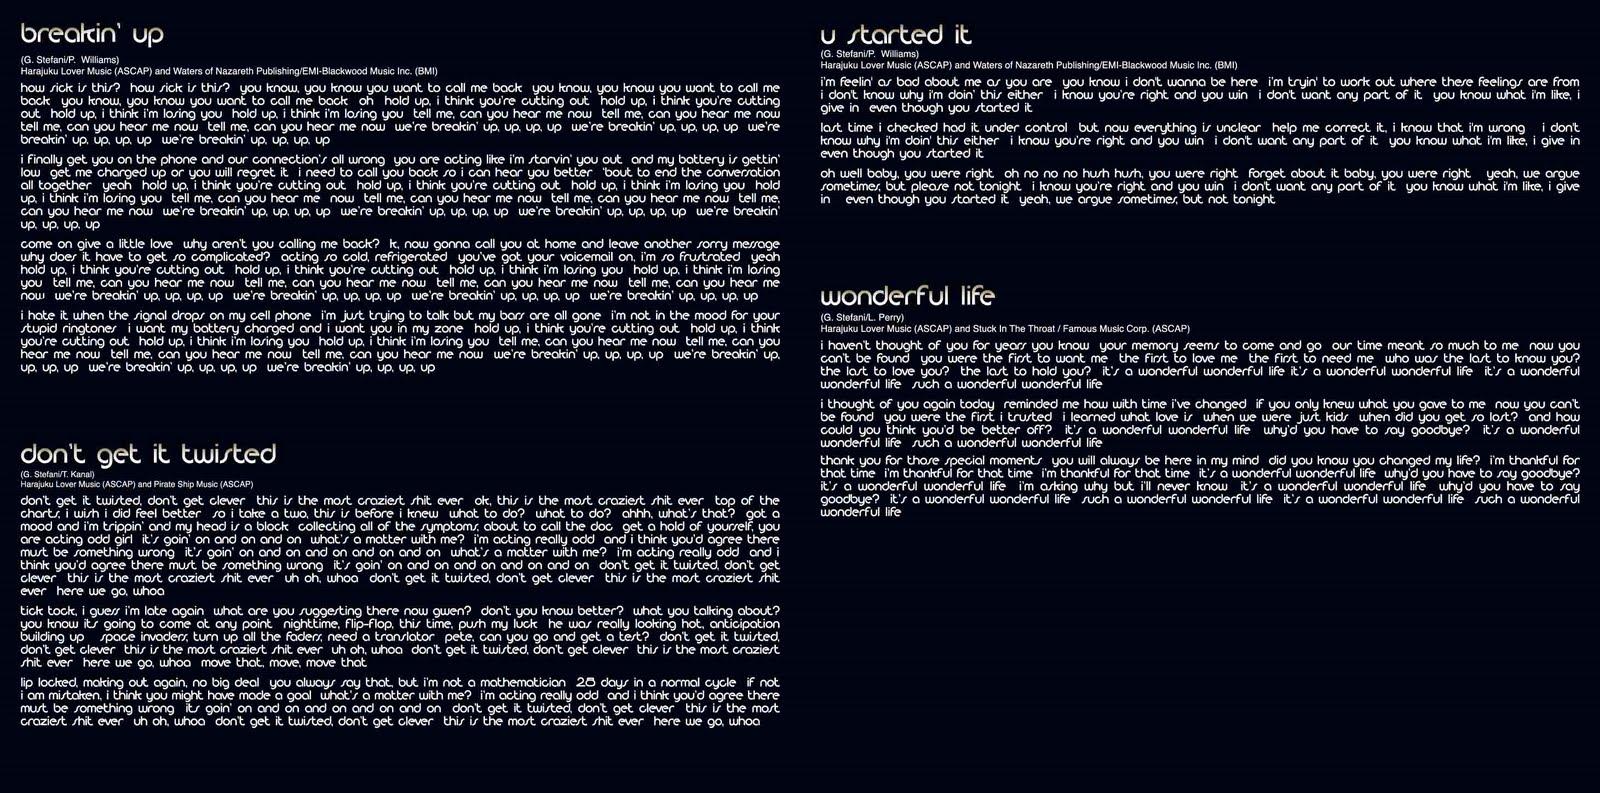 http://1.bp.blogspot.com/_YJM766qf5ps/S61K6YTEIPI/AAAAAAAACvQ/TyO0slg3aaI/s1600/Gwen+Stefani+-+The+Sweet+Escape-6.jpg